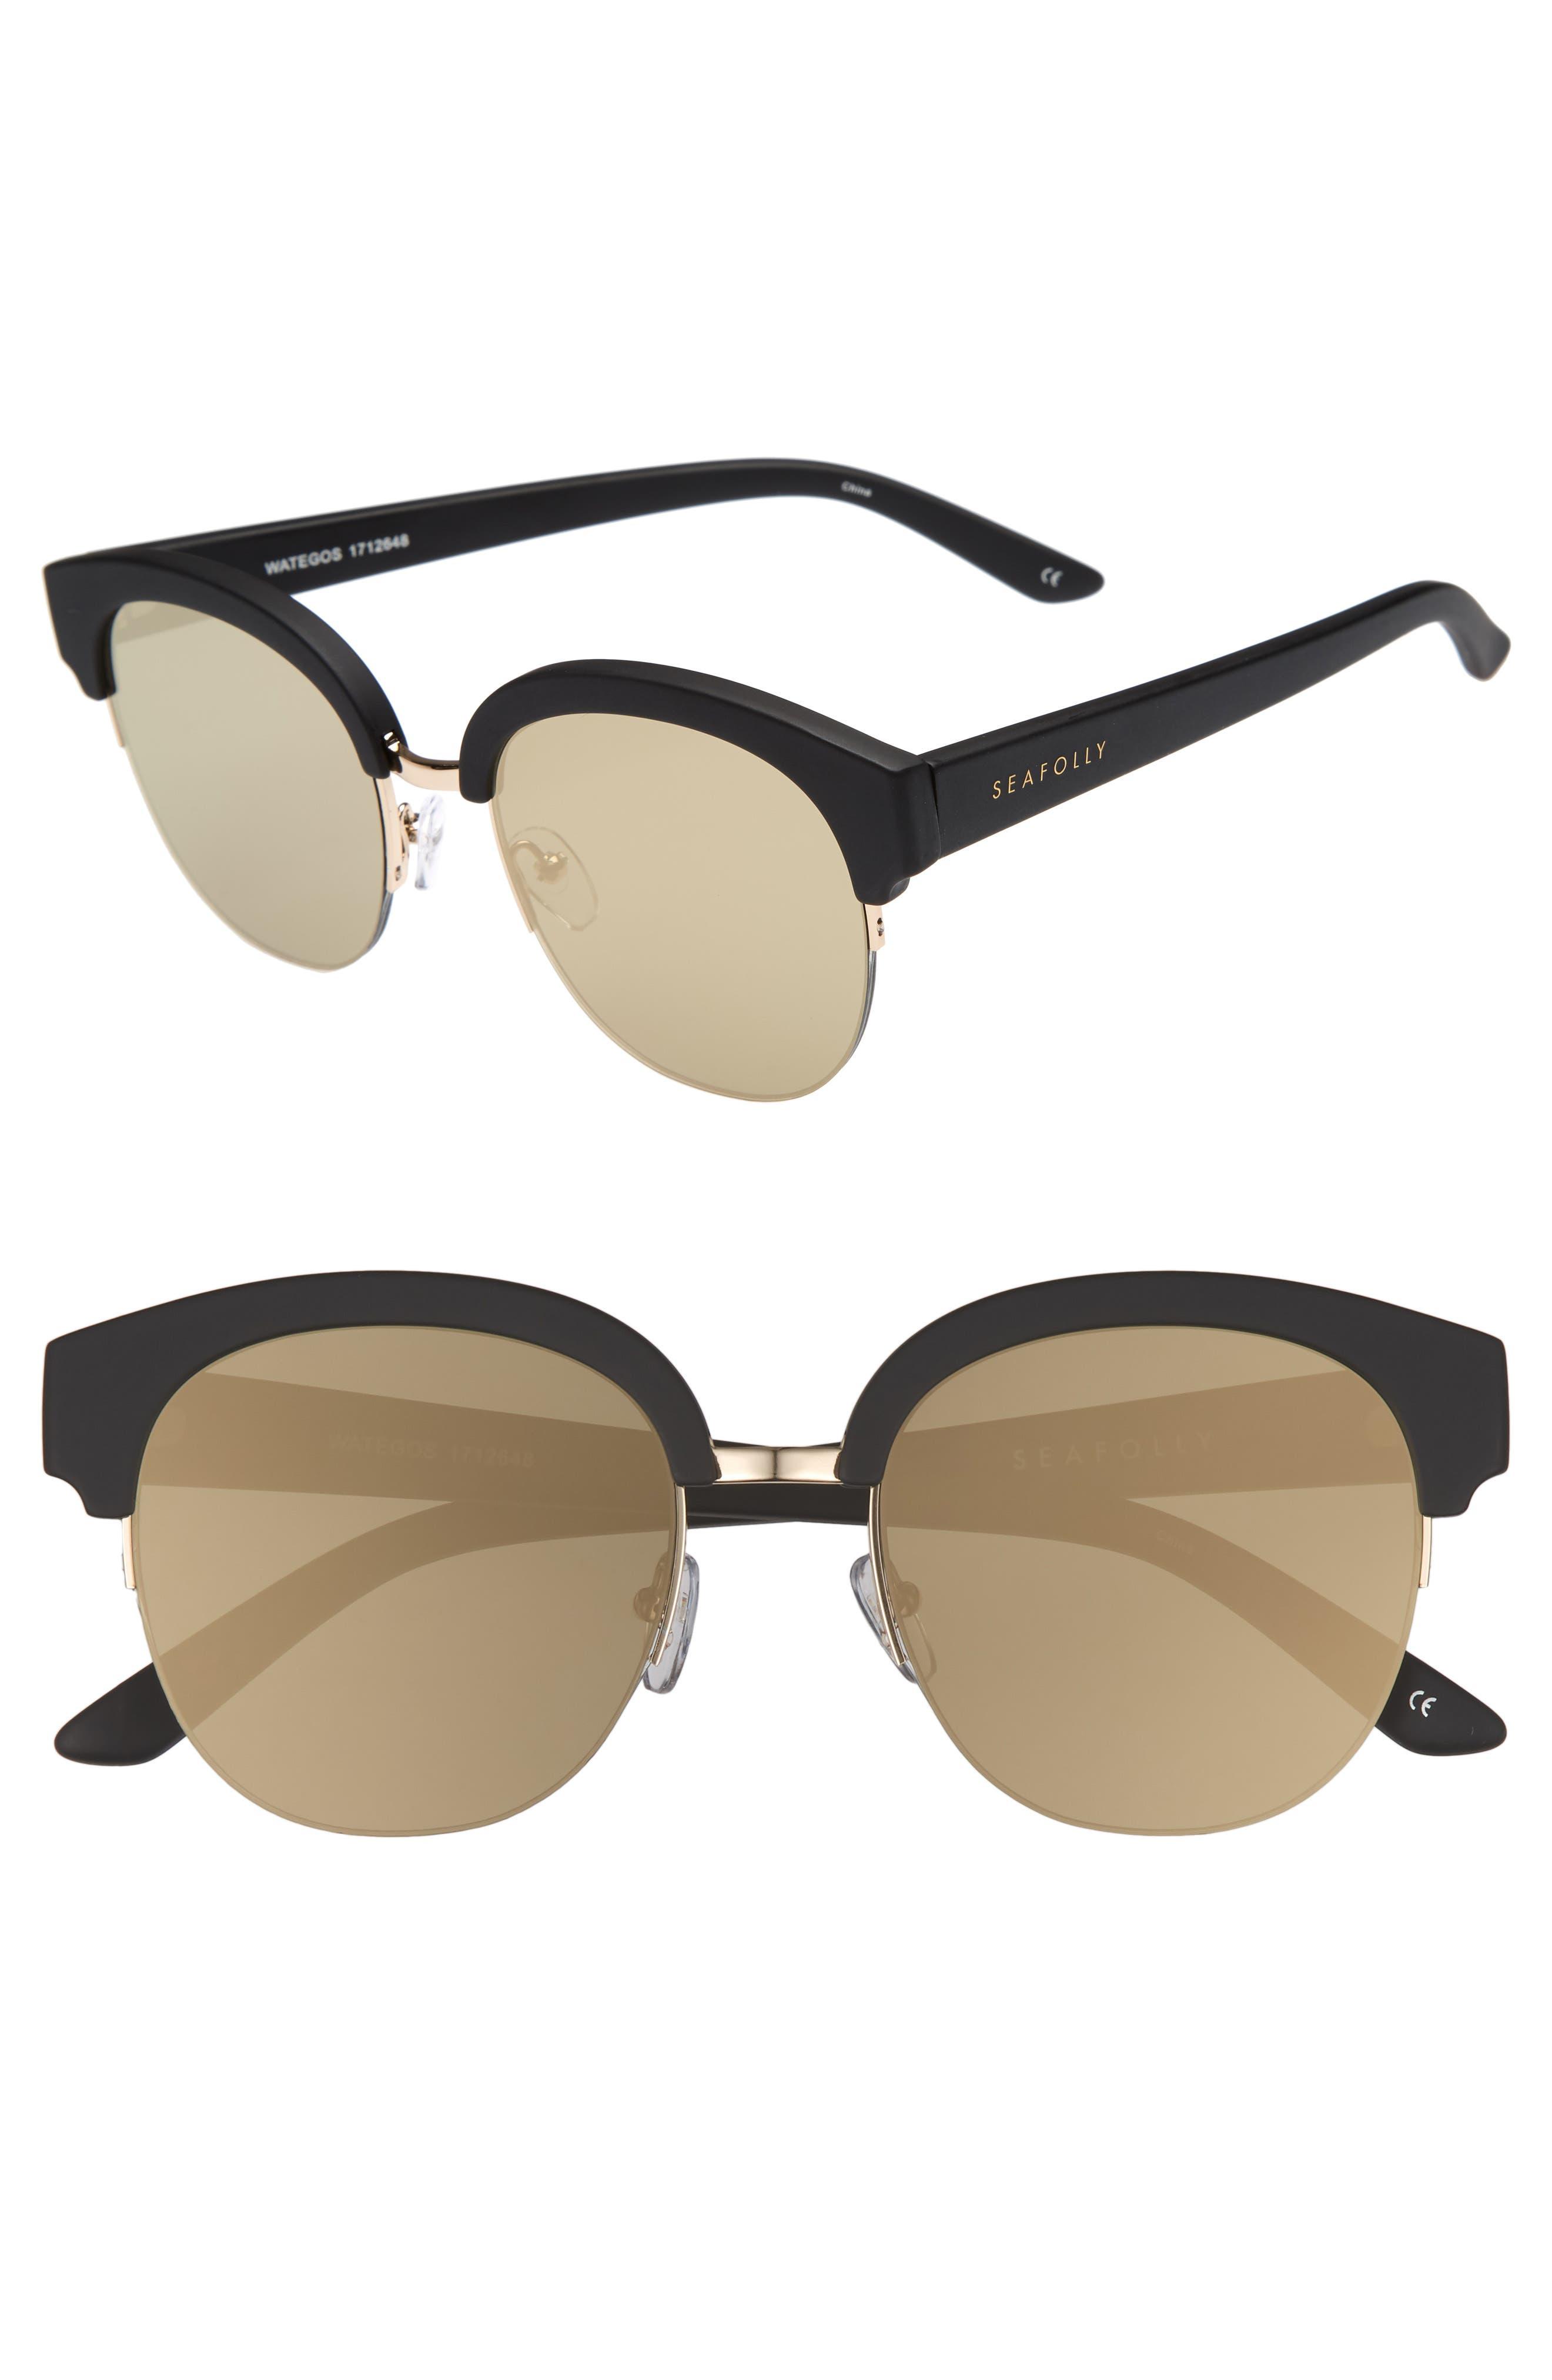 Wategos 53mm Cat Eye Sunglasses,                         Main,                         color, Black